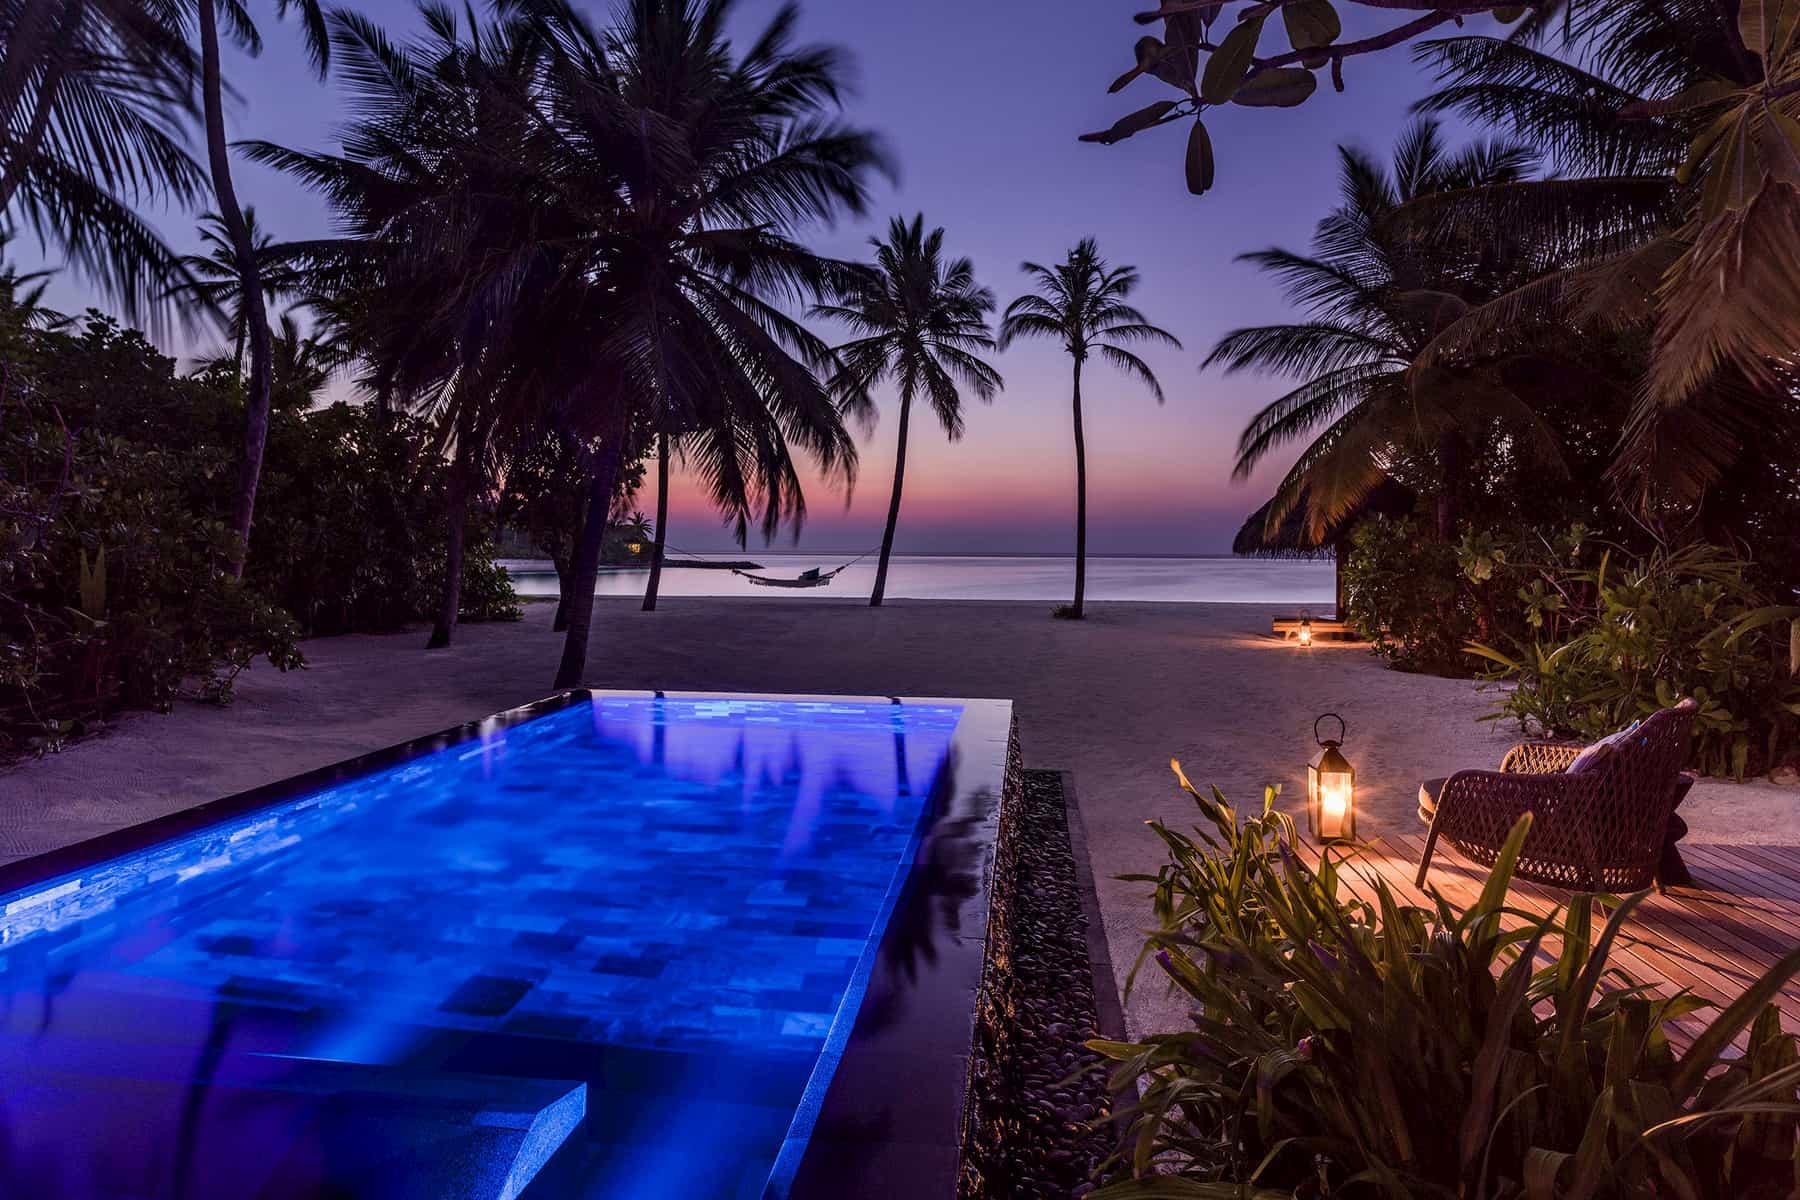 Resort Maldive One & Only Reehi Rah beach villa with pool